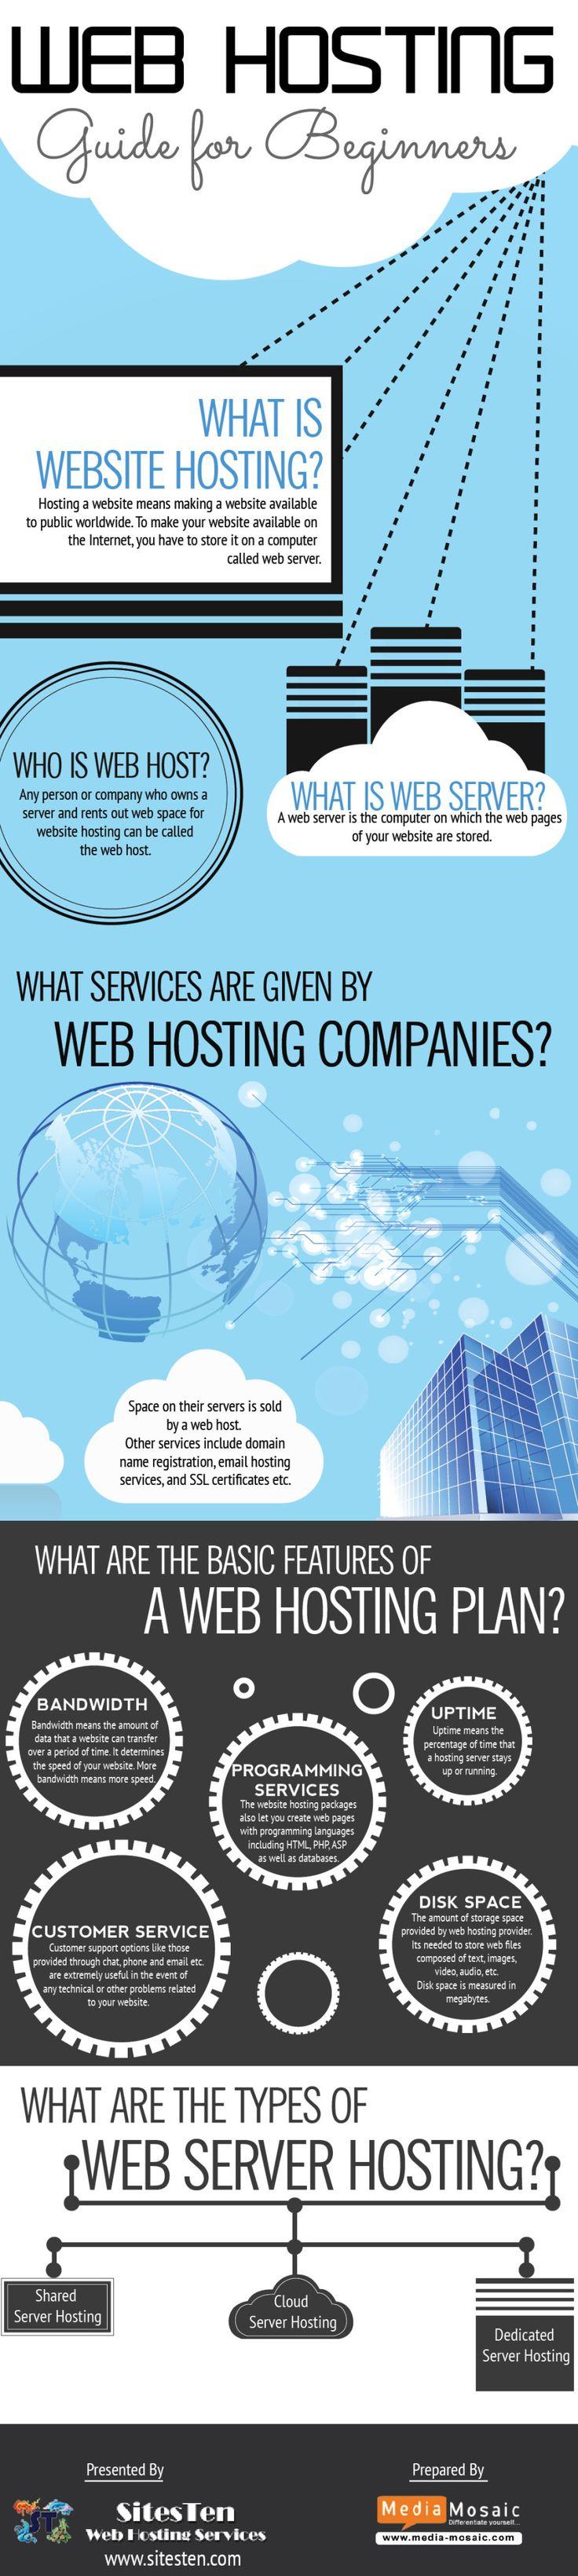 Web Hosting Guide For Beginners .  #infographic #WebHosting #Blogging